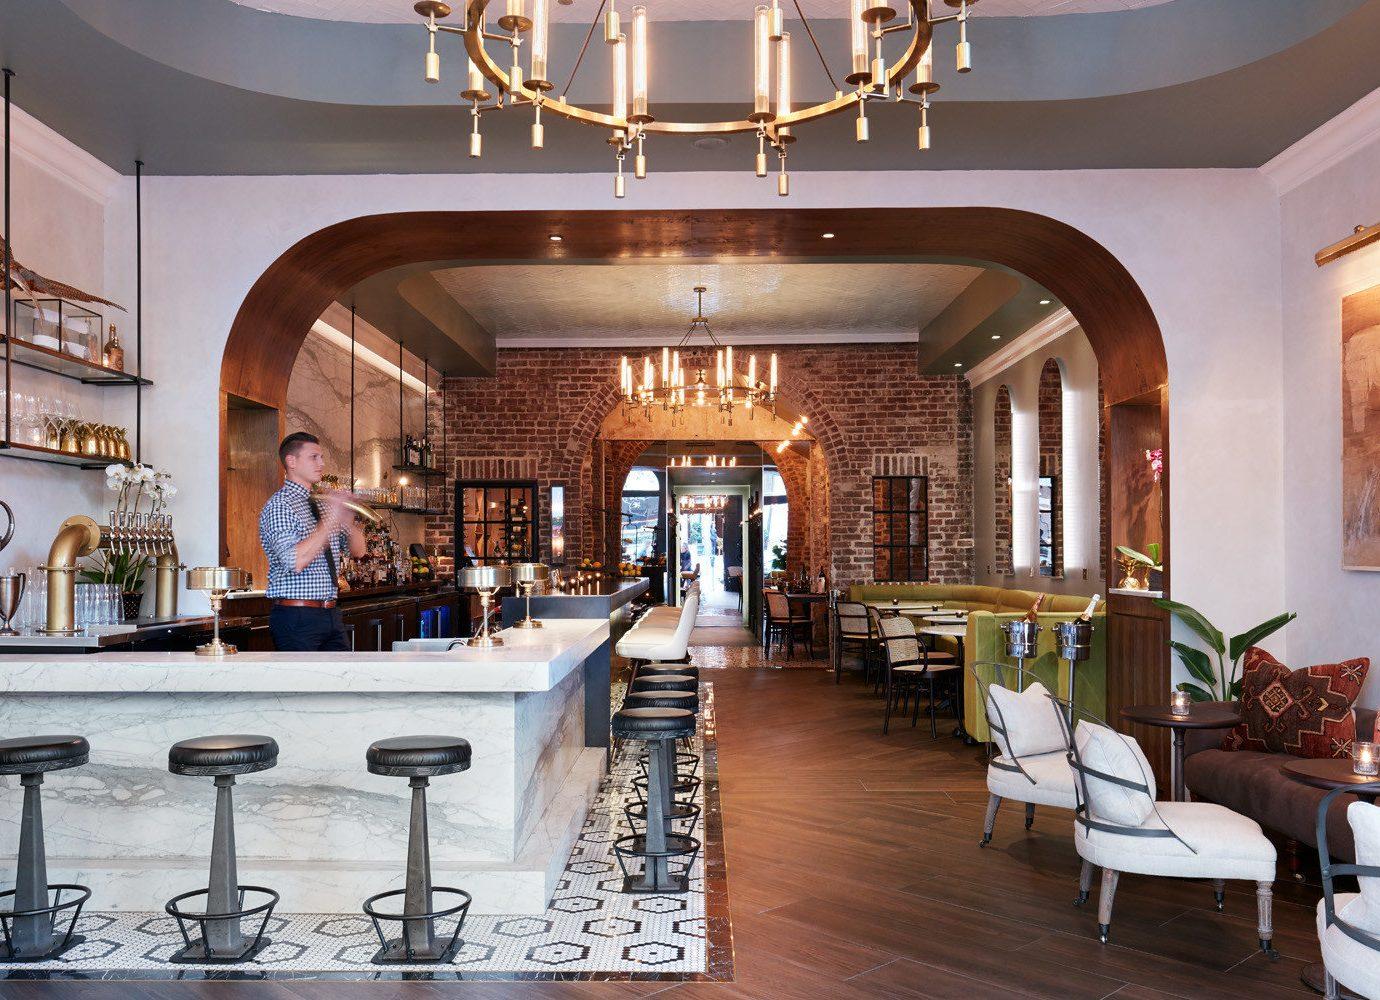 Artillery Bar in Savannah Georgia